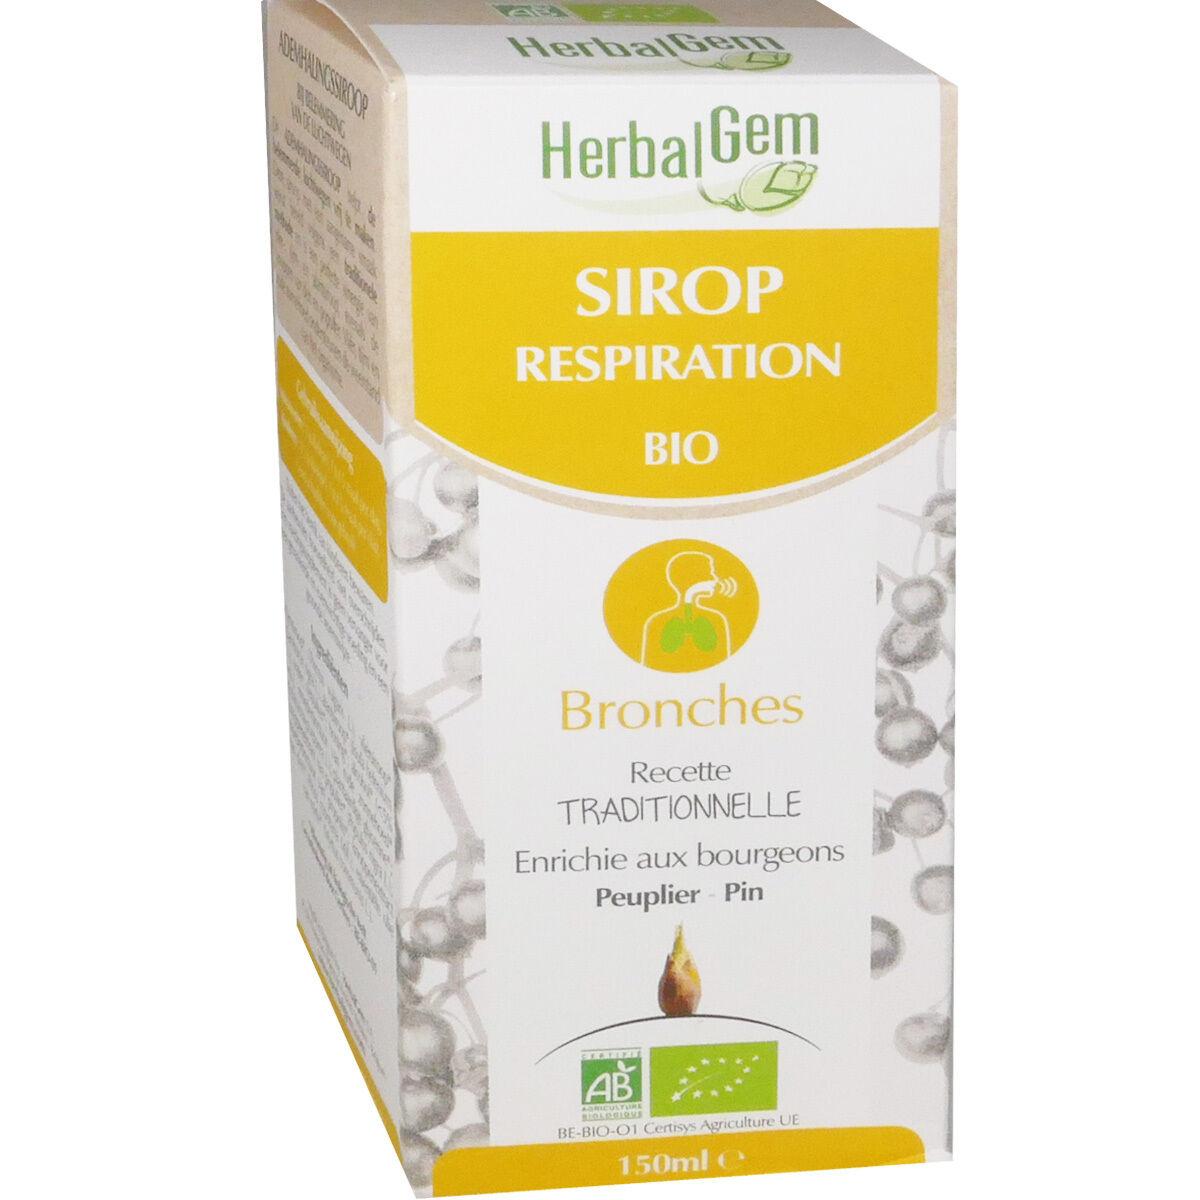 Herbalgem sirop respiration bio bronches 150 ml